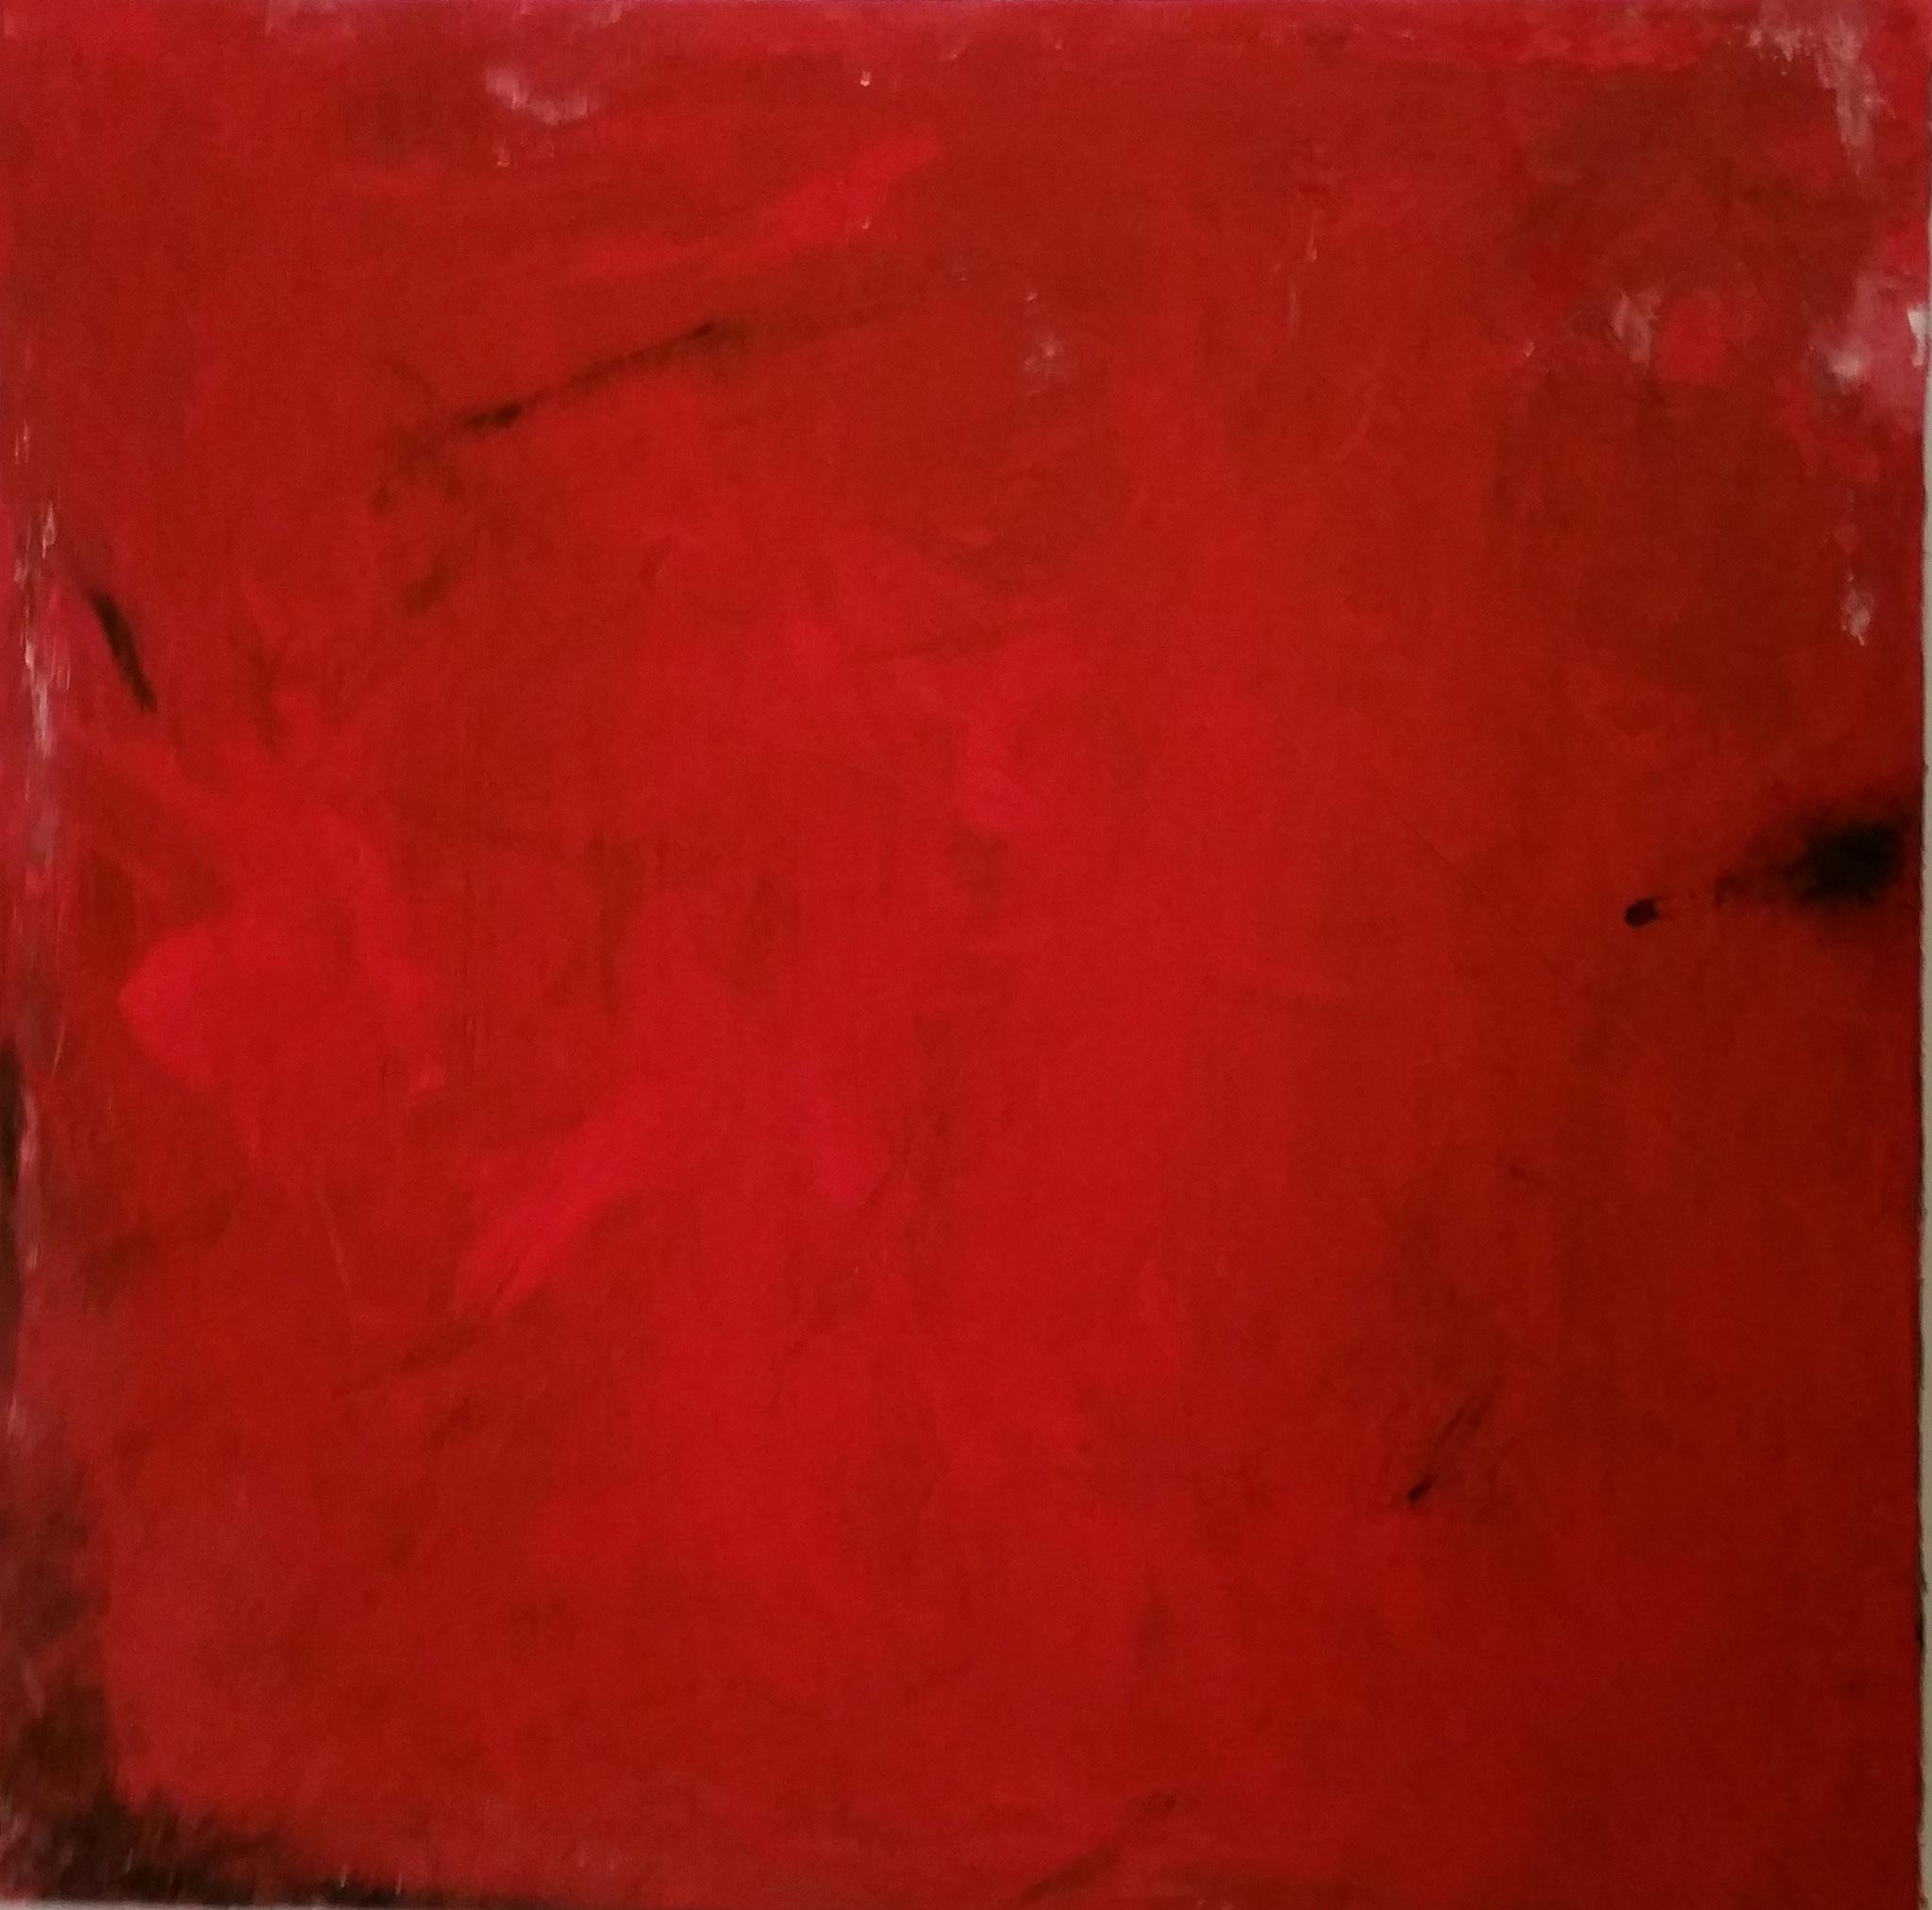 Rot, 70x70 Leinwand, Spachtelmasse, Acryl, Tusche